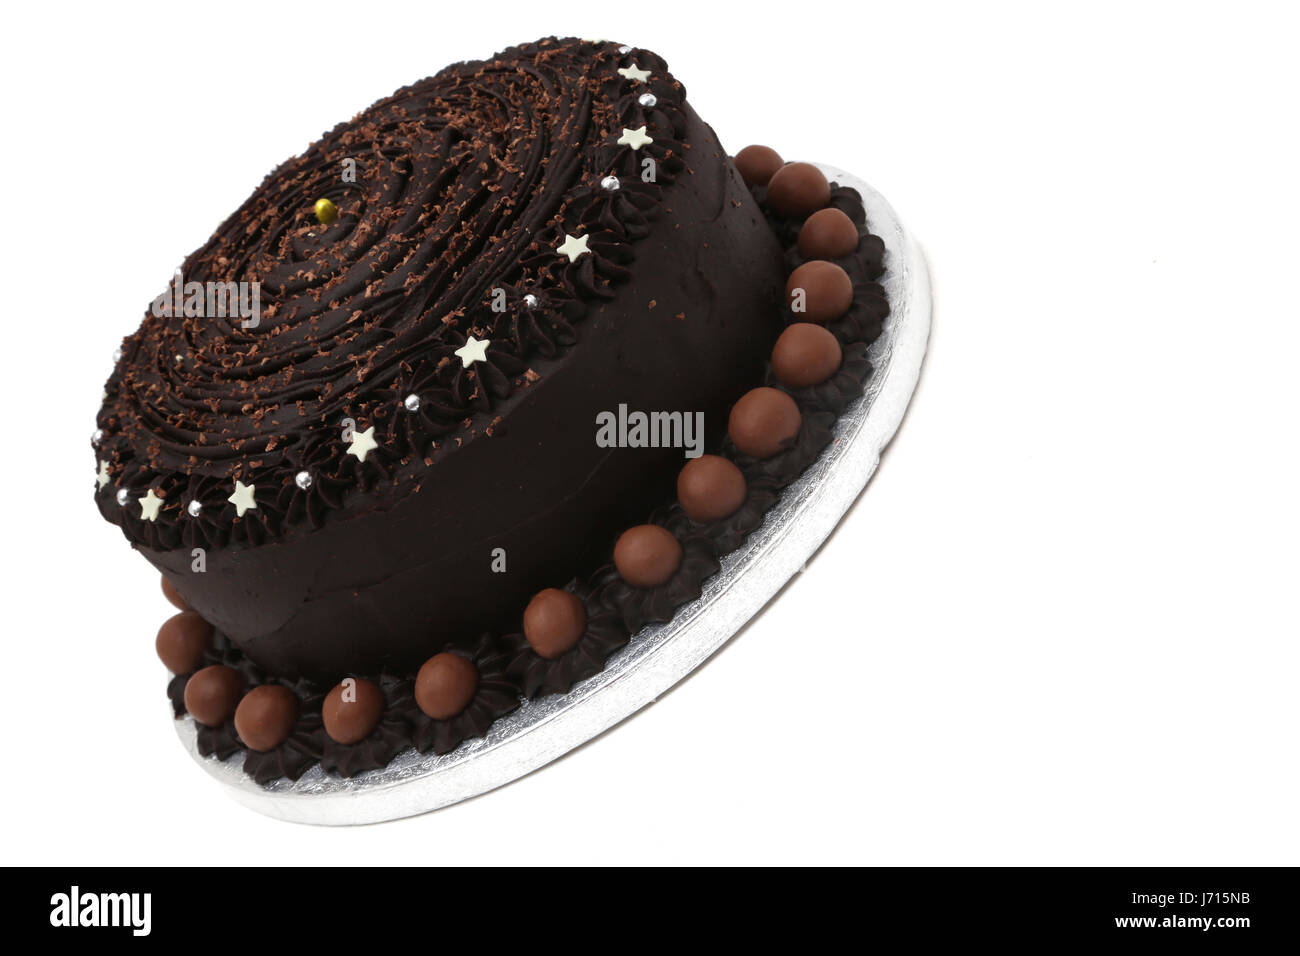 Home made Chocolate Cake with maltesers - Stock Image